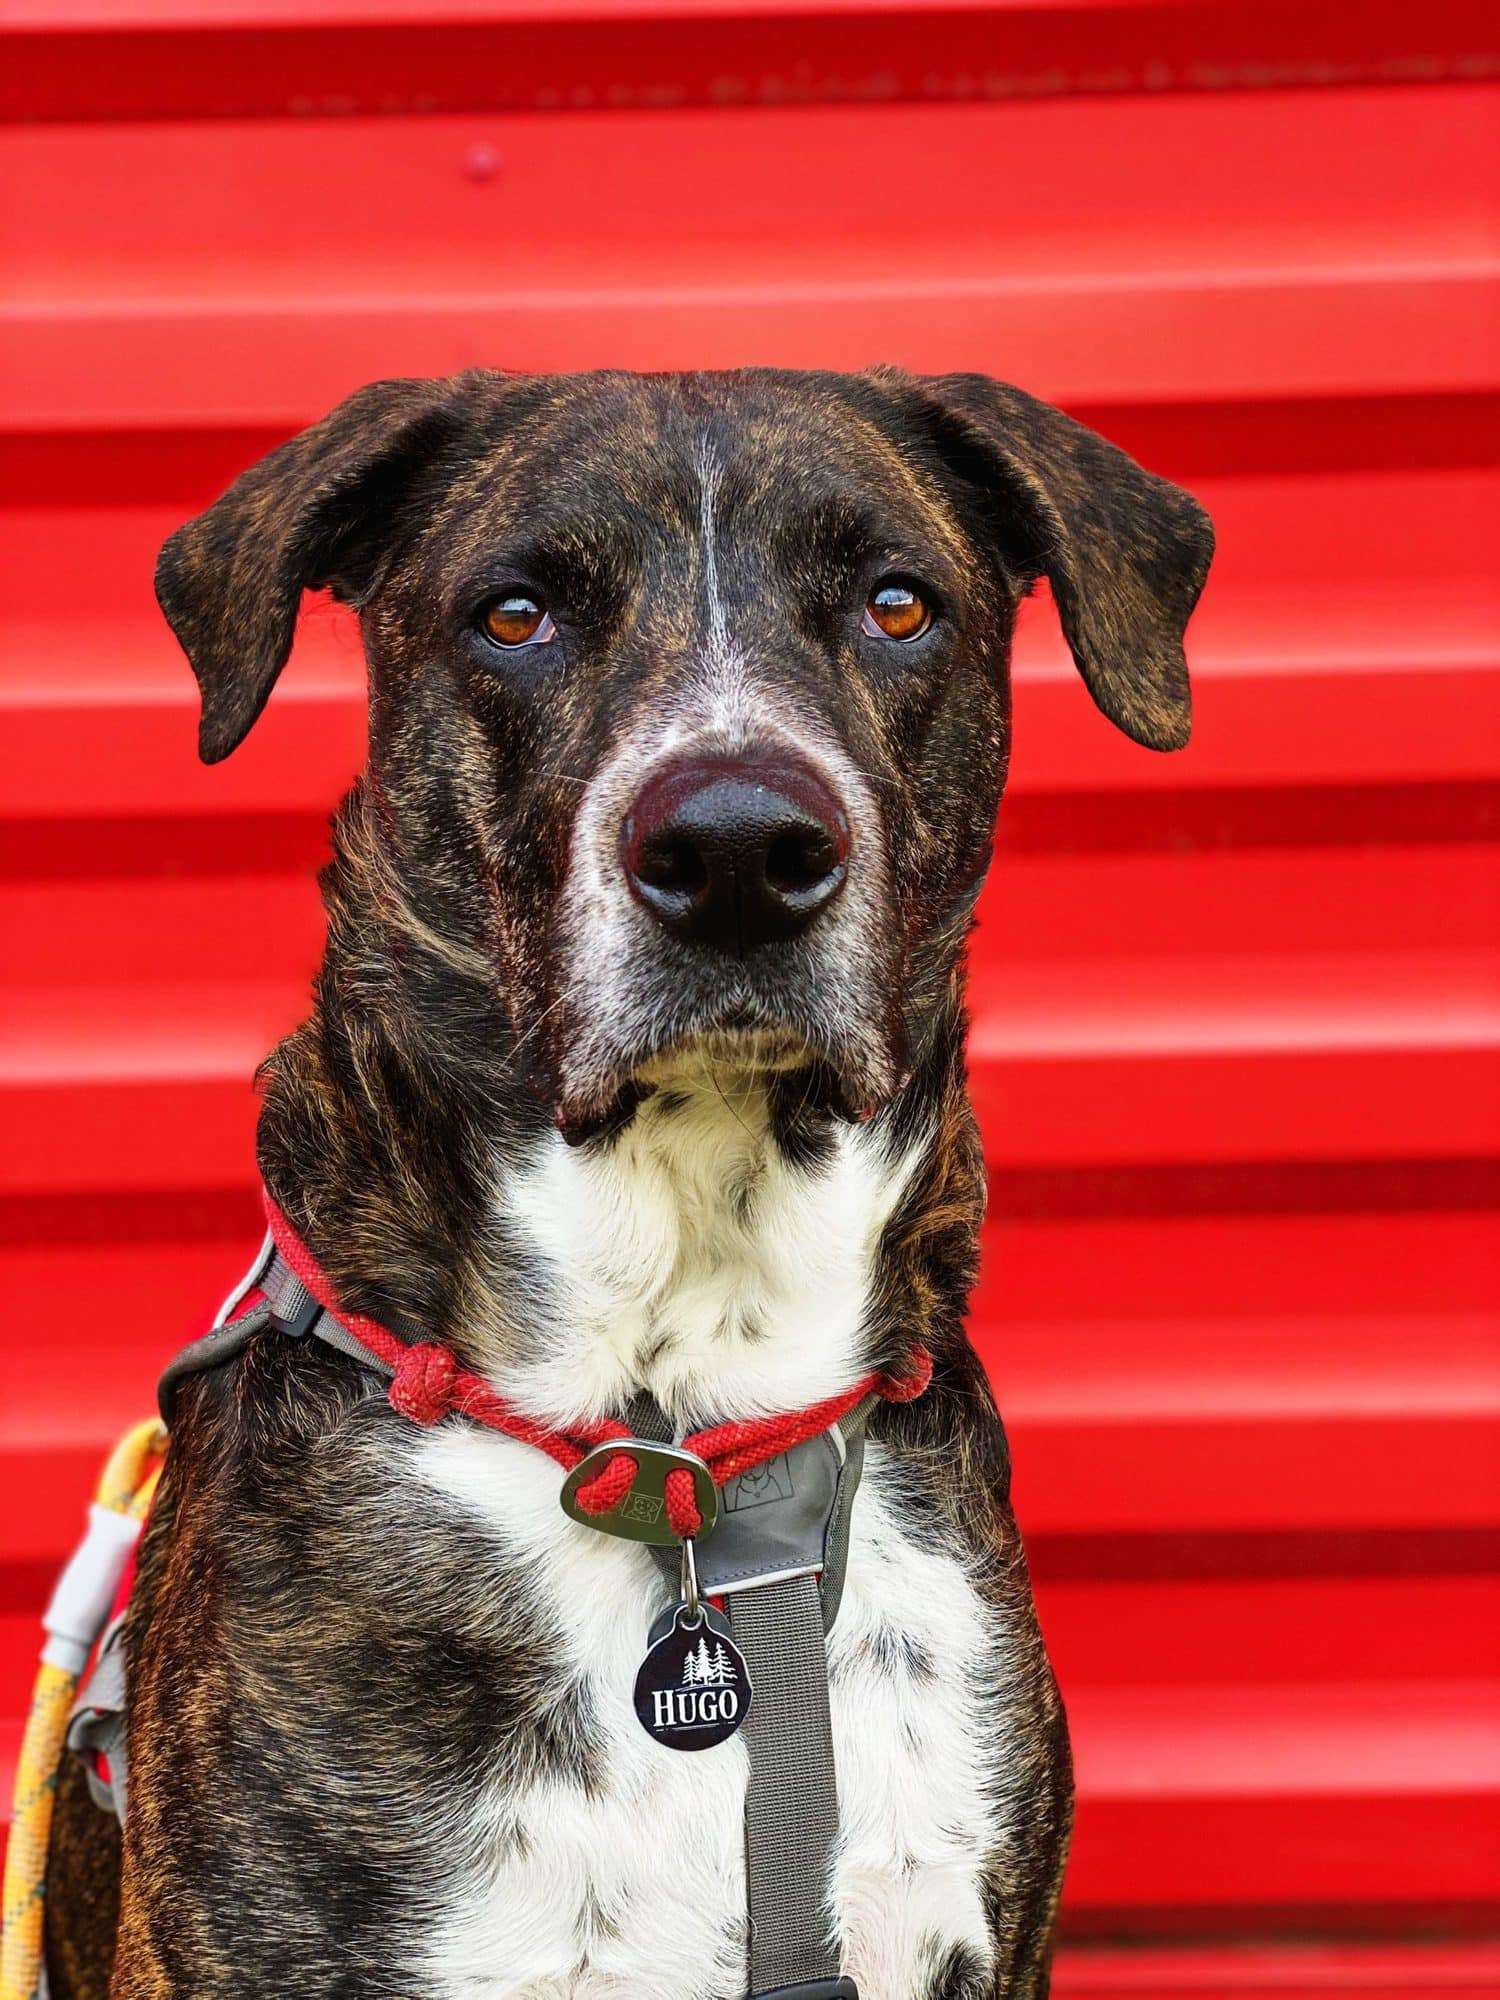 Retrato de perro con fondo rojo